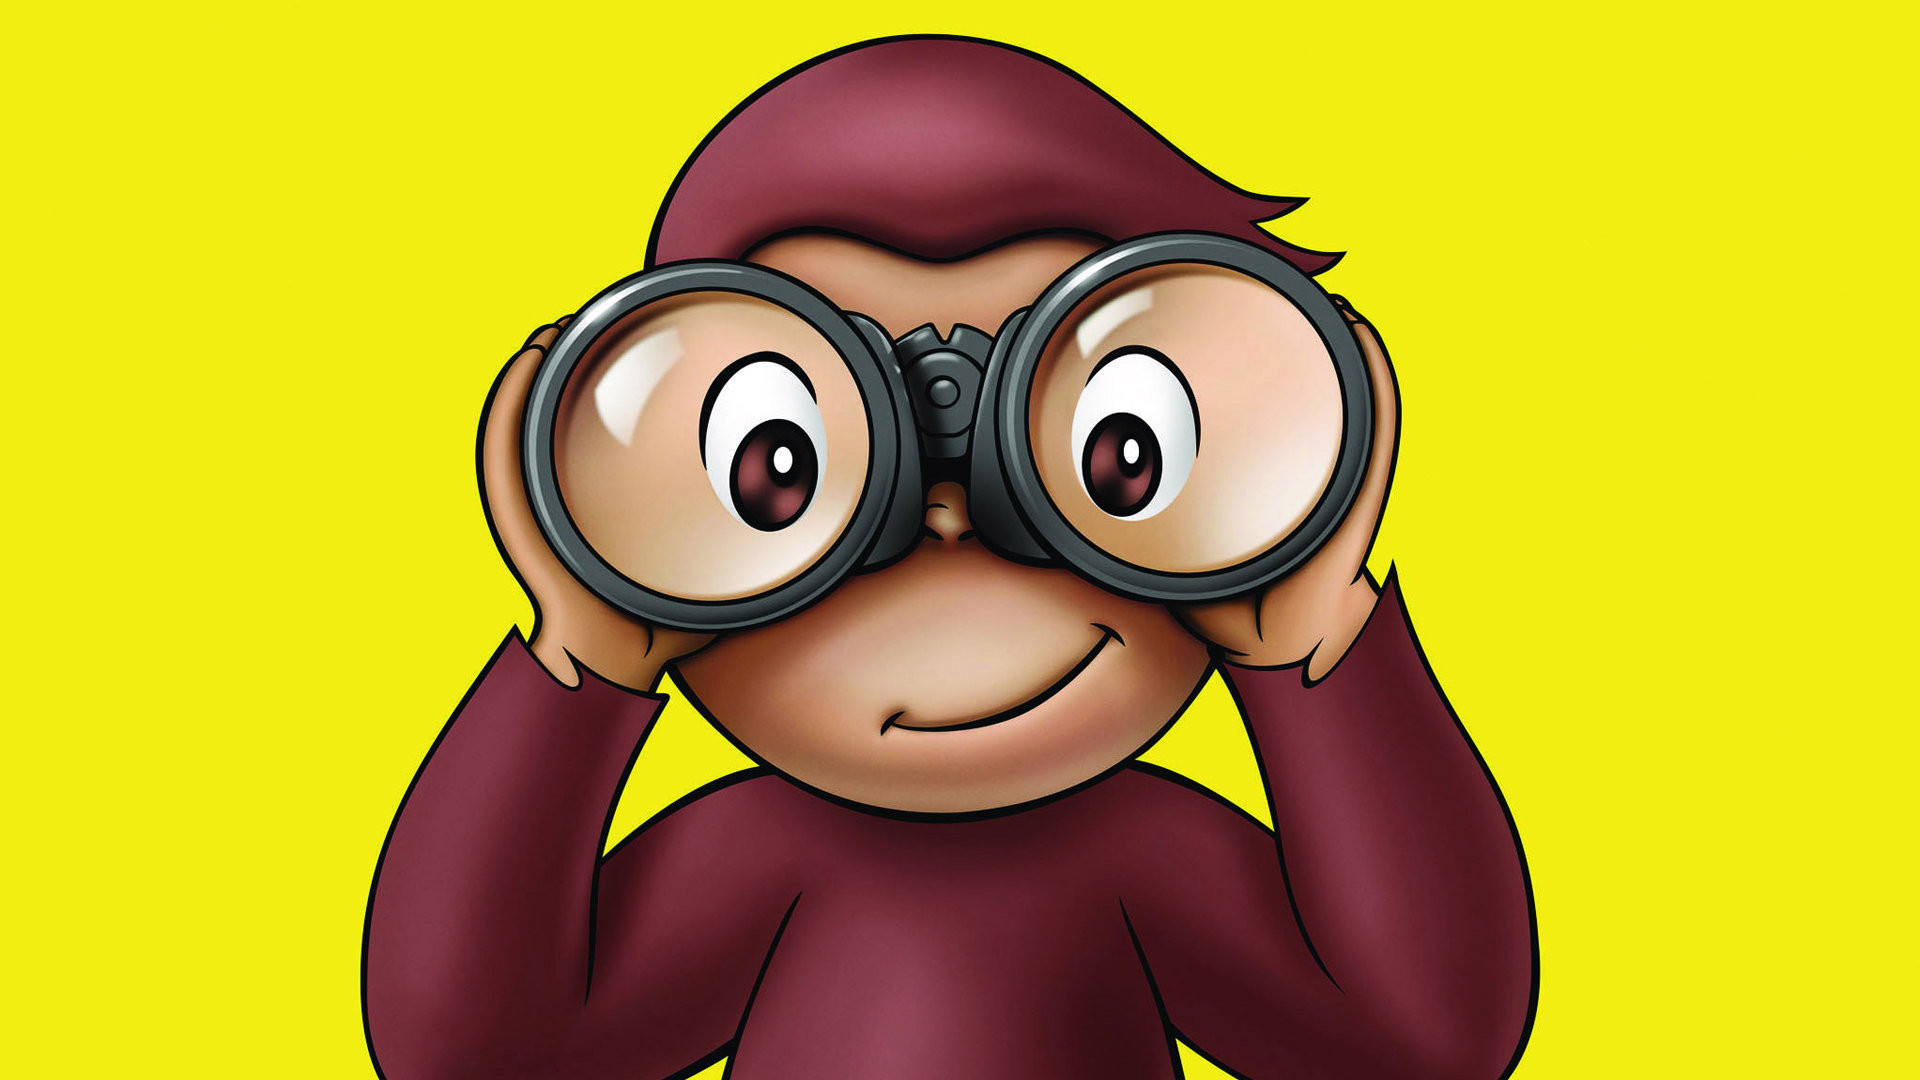 Wallpaper Curious George, animated movie, 2016 movie, monkey